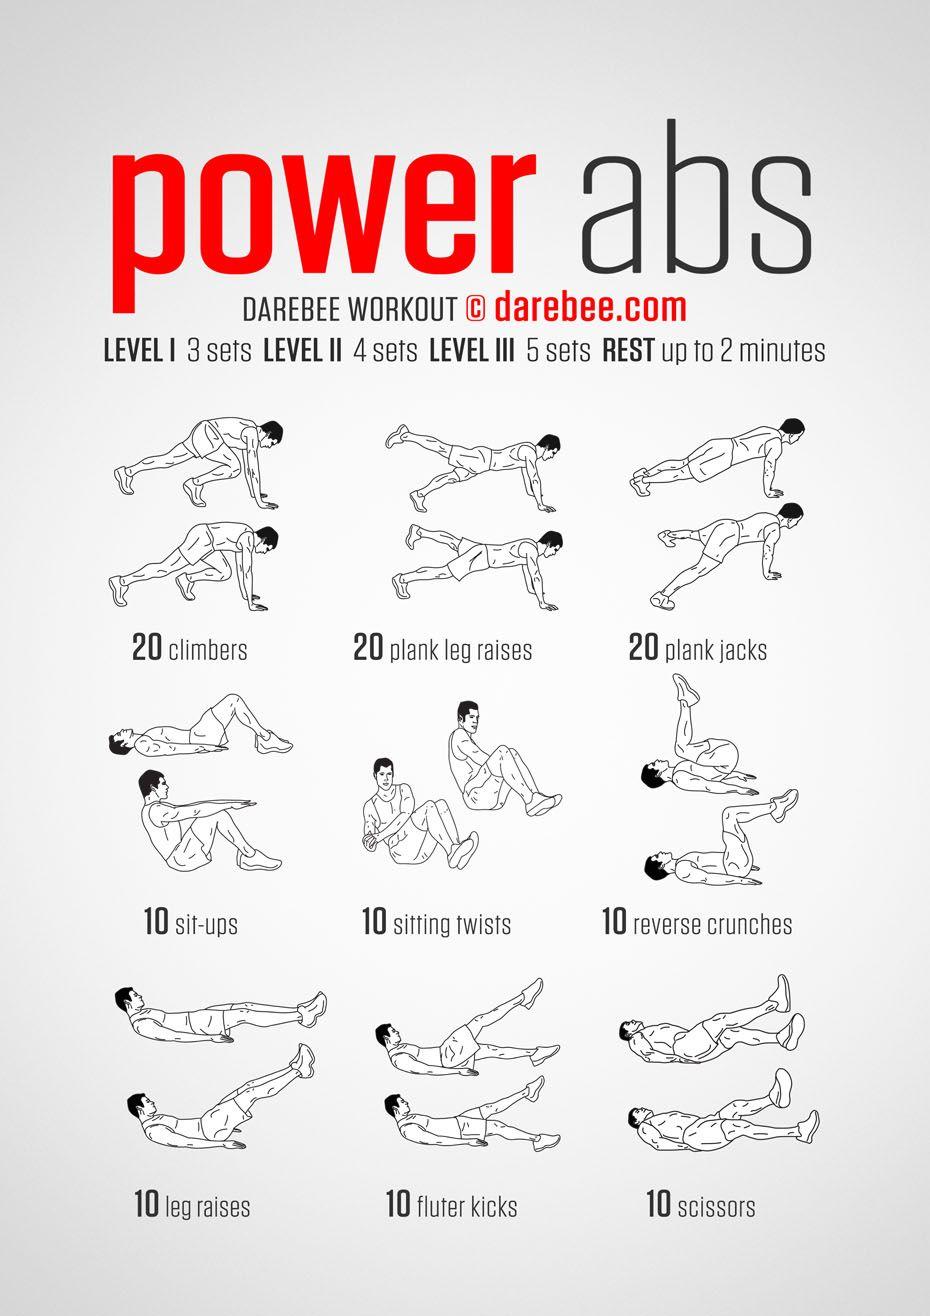 Power abs darebee workout ab workouts pinterest